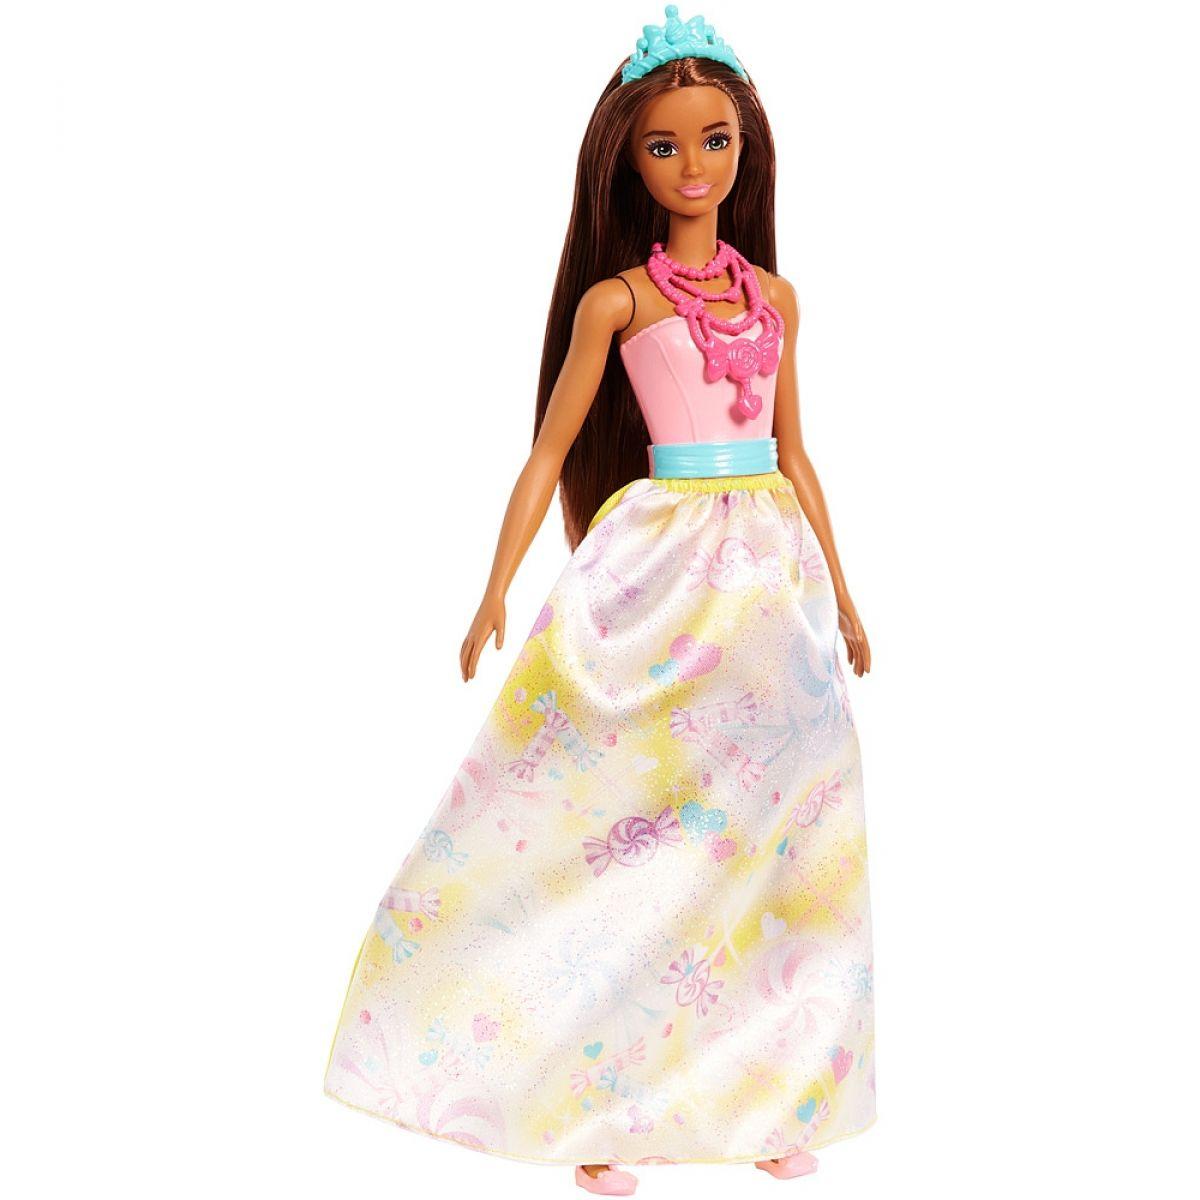 Mattel Barbie Princezna hnědé vlasy žlutá